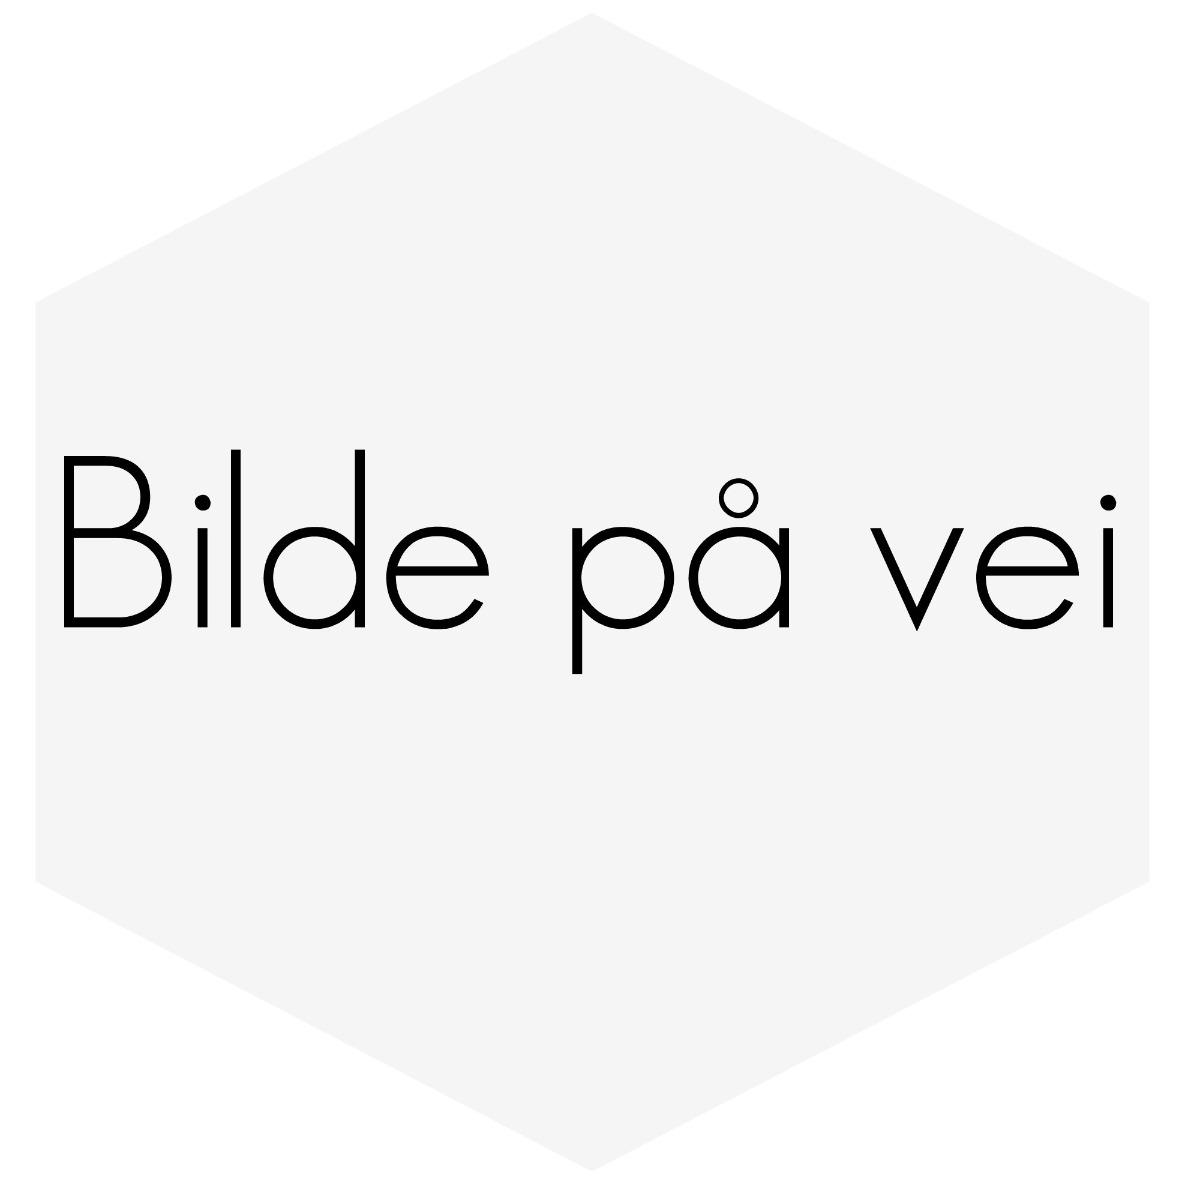 "SILIKONSLANGE RØD REDUSERING 2,5-3,125"" (63-80MM)"